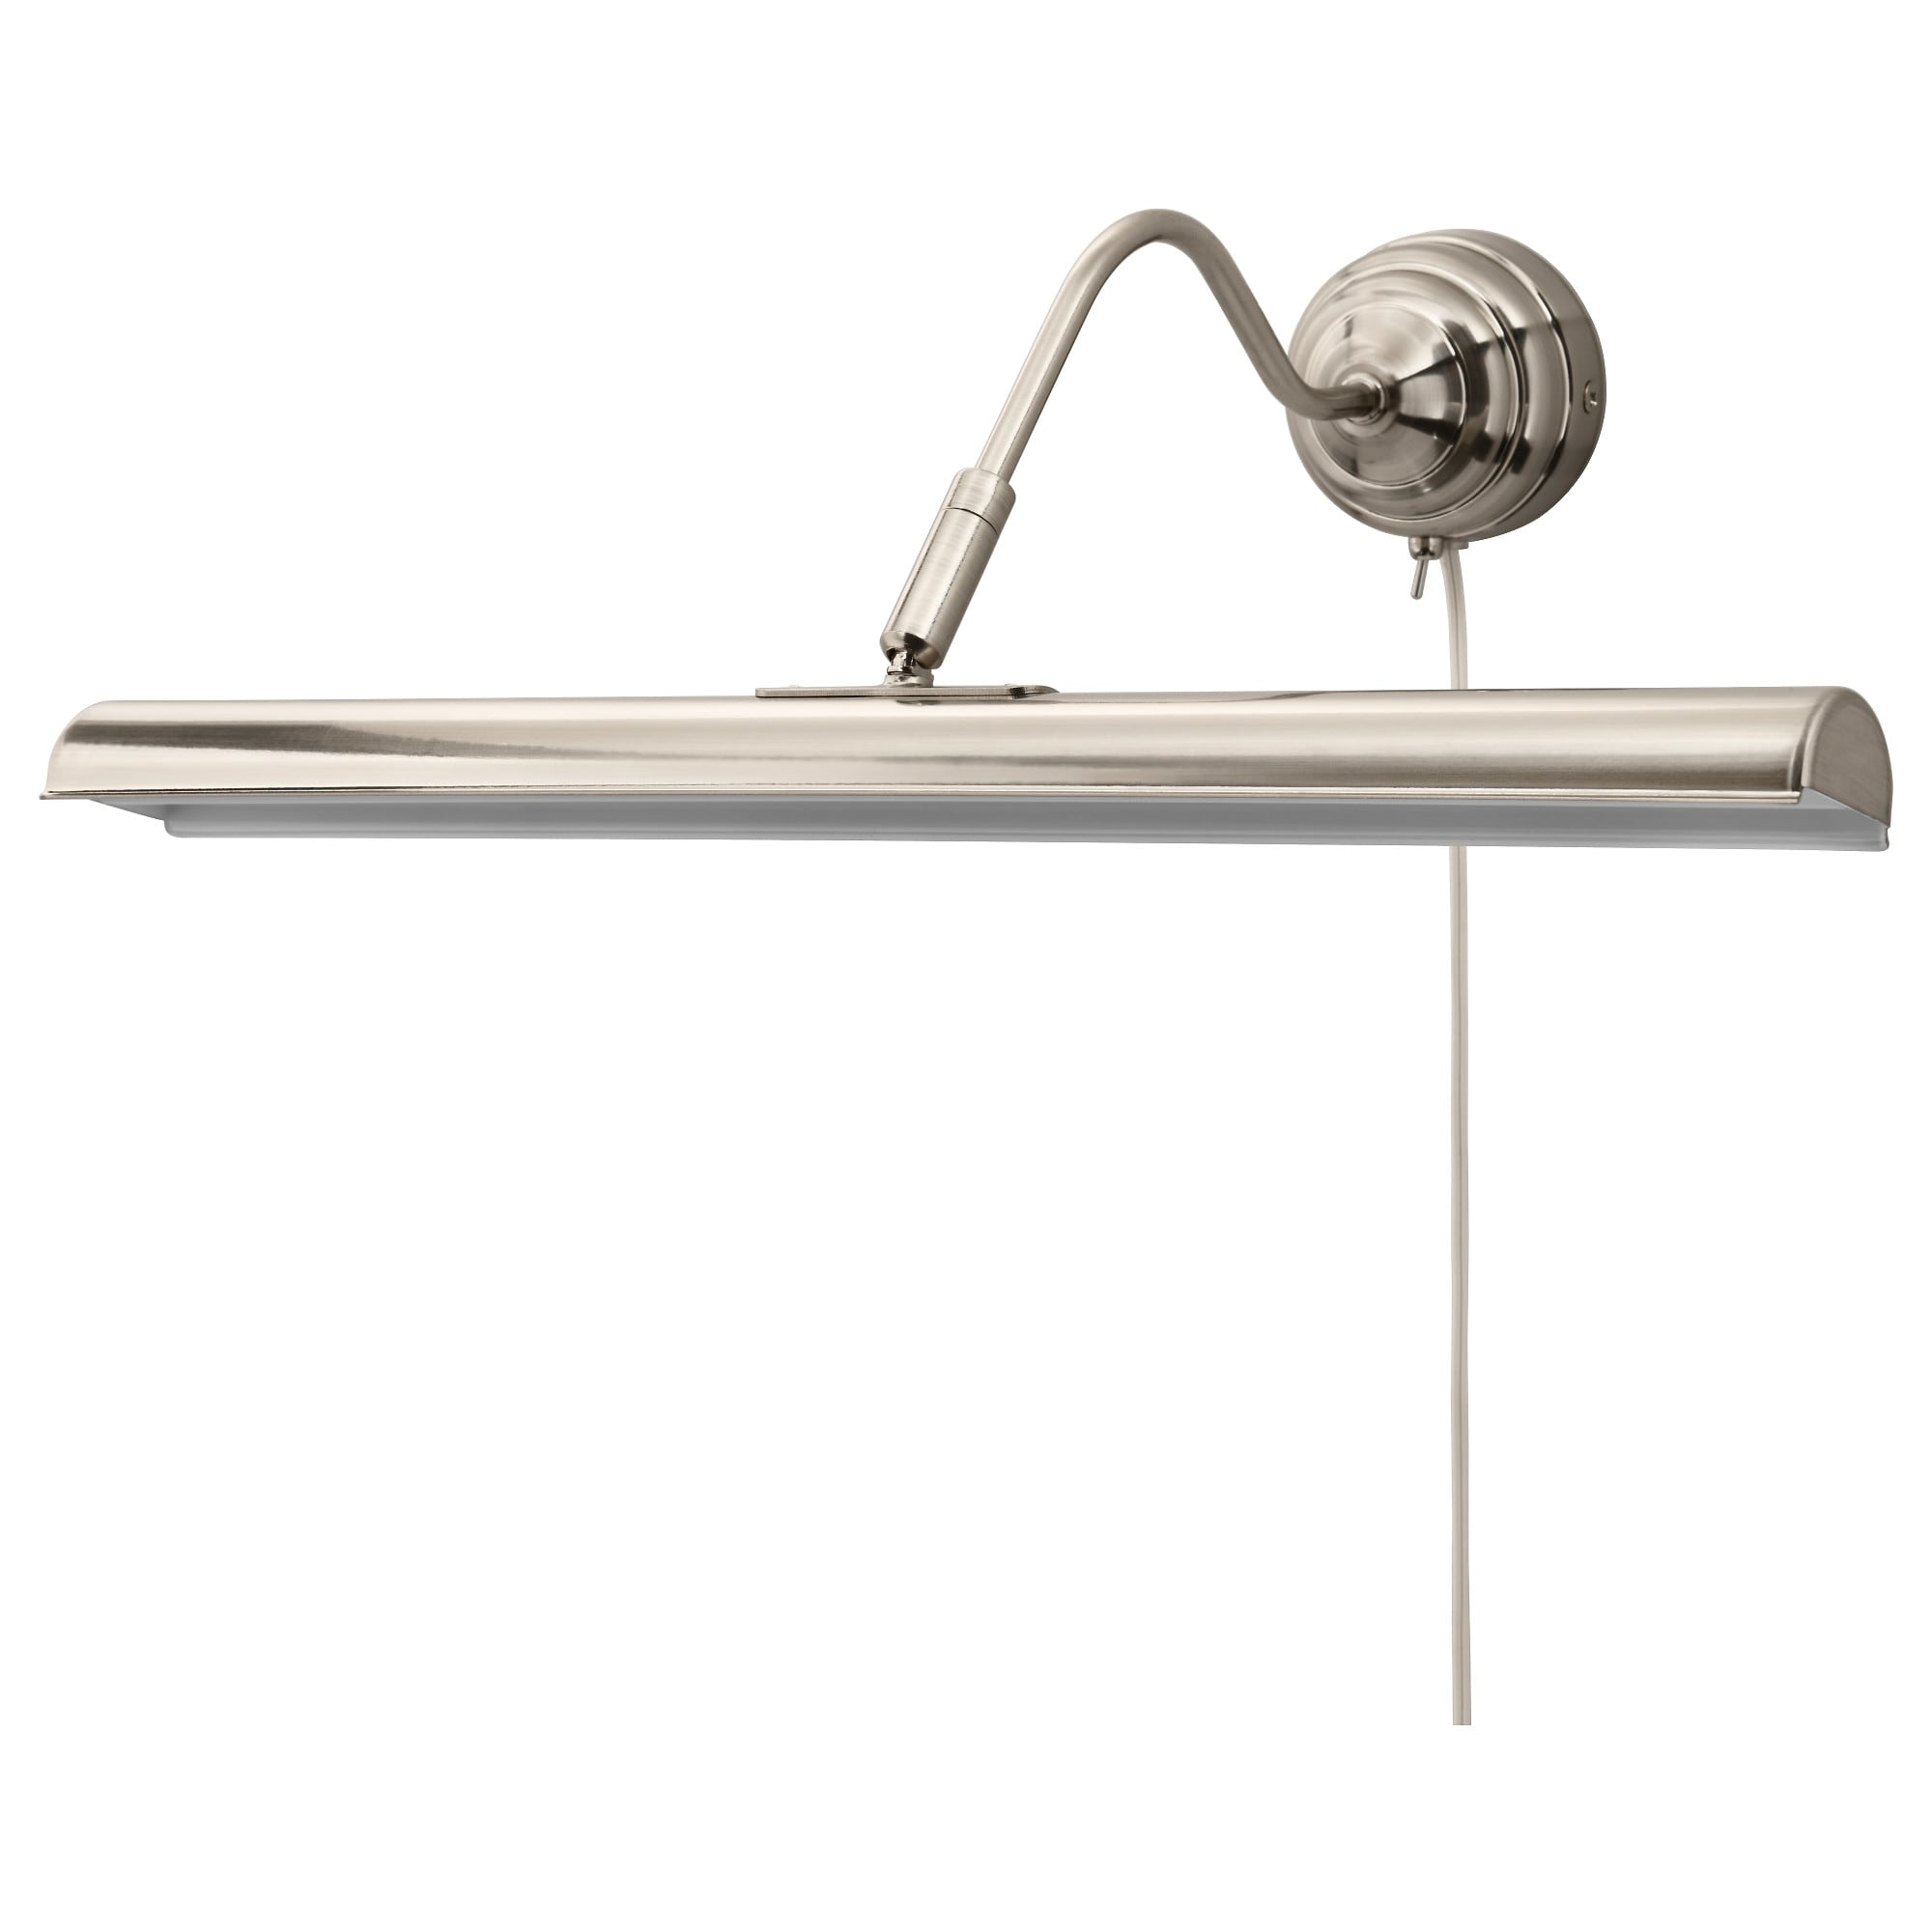 Ikea Arstid Eclairage Cadre A Del Nickele Deco Toilettes Eclairage Ikea Et Ikea